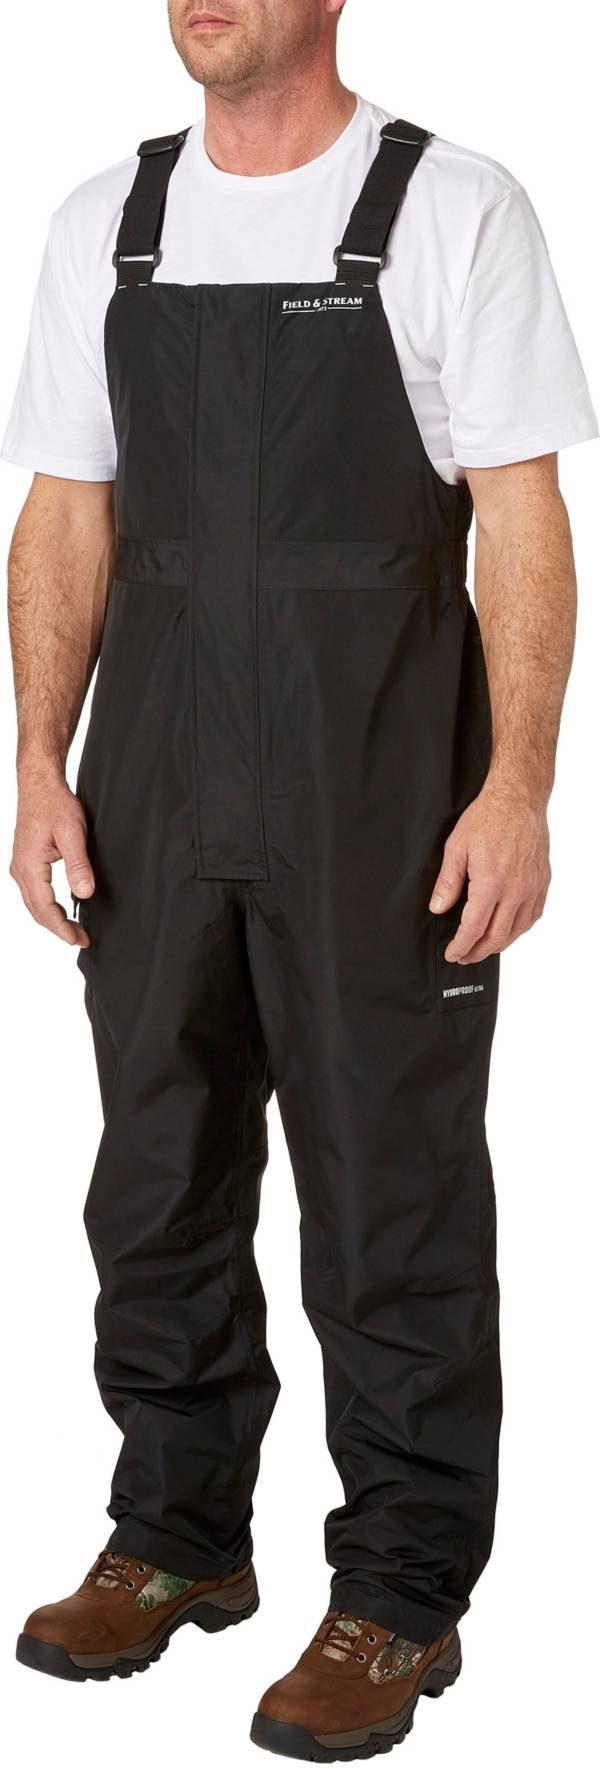 Field & Stream Men's Squall Defender Rain Bib product image